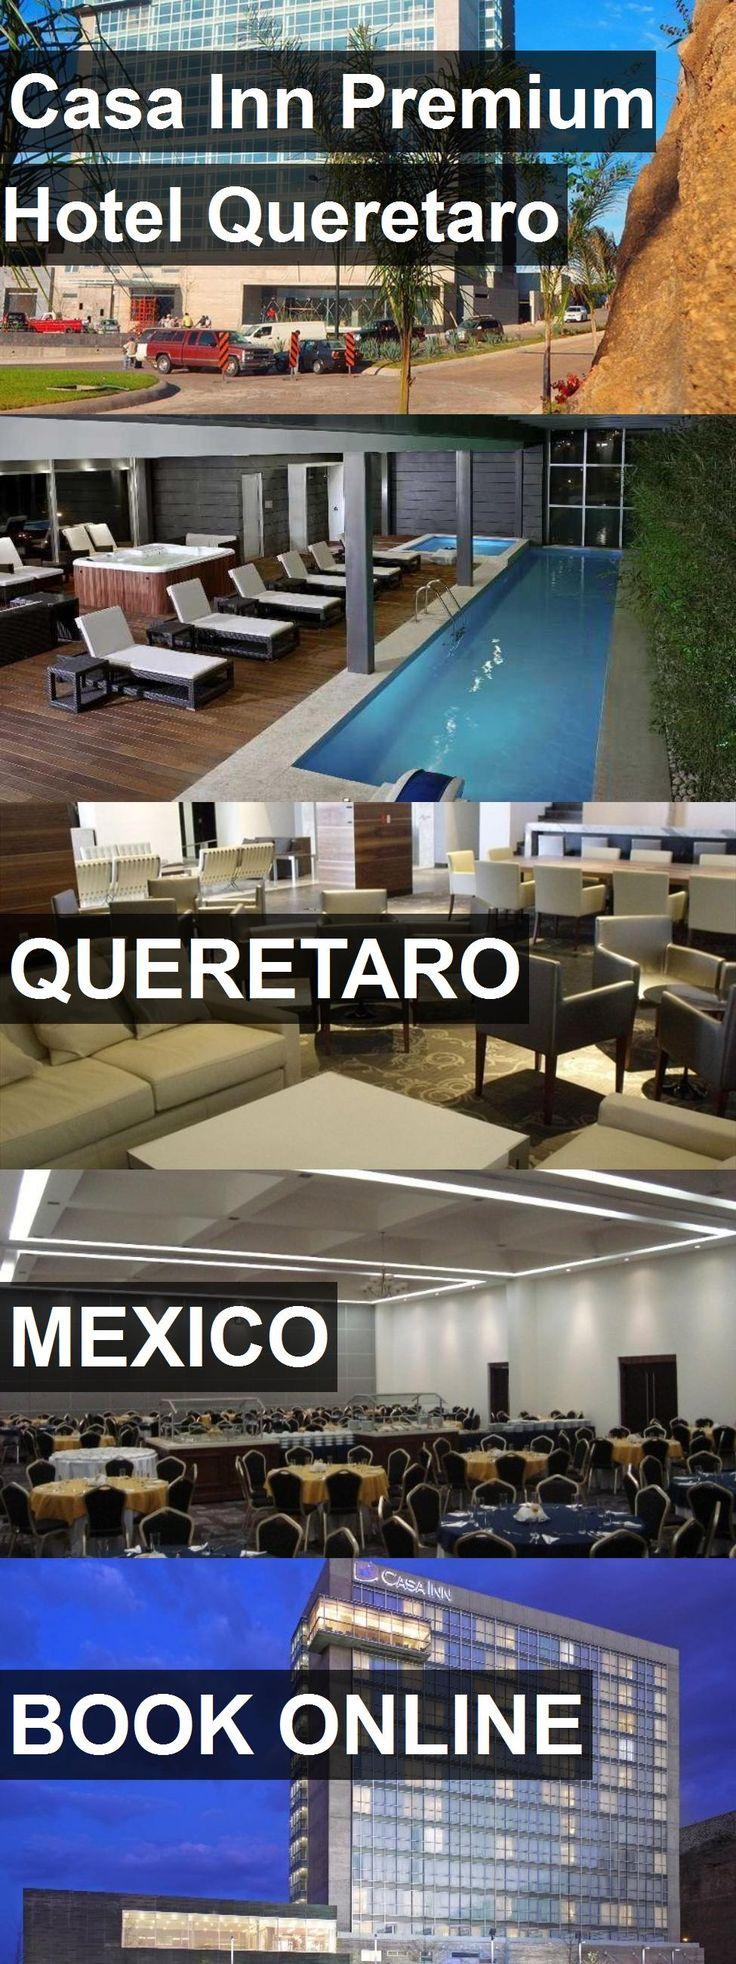 Hotel Casa Inn Premium Hotel Queretaro in Queretaro, Mexico. For more information, photos, reviews and best prices please follow the link. #Mexico #Queretaro #hotel #travel #vacation